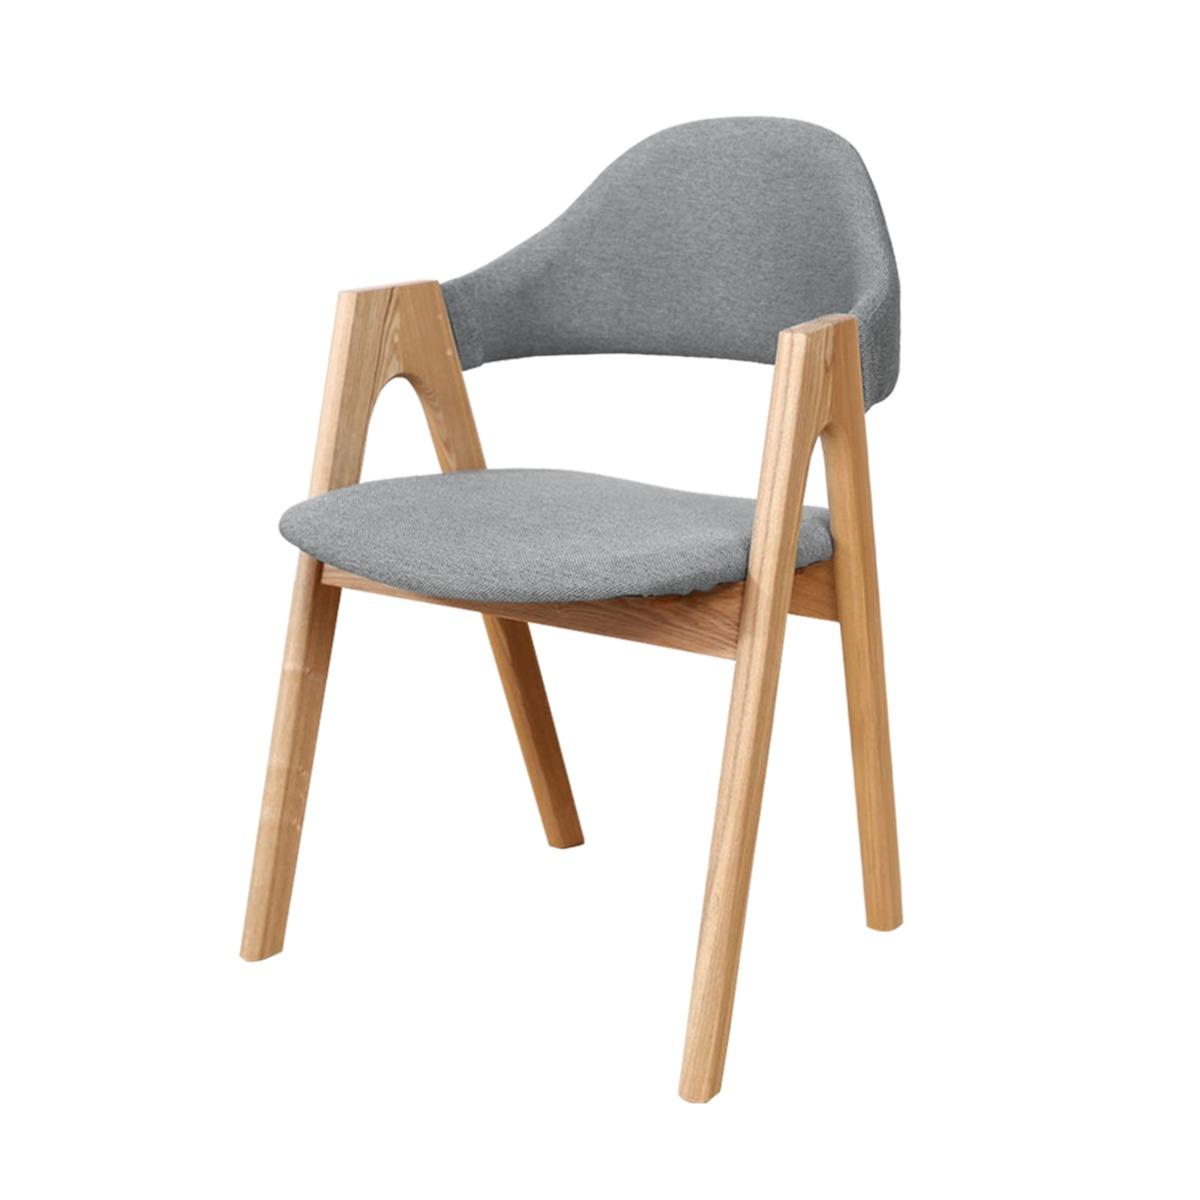 Brixham Oak & Fabric Dining Chair (Set of 2) in Light Grey